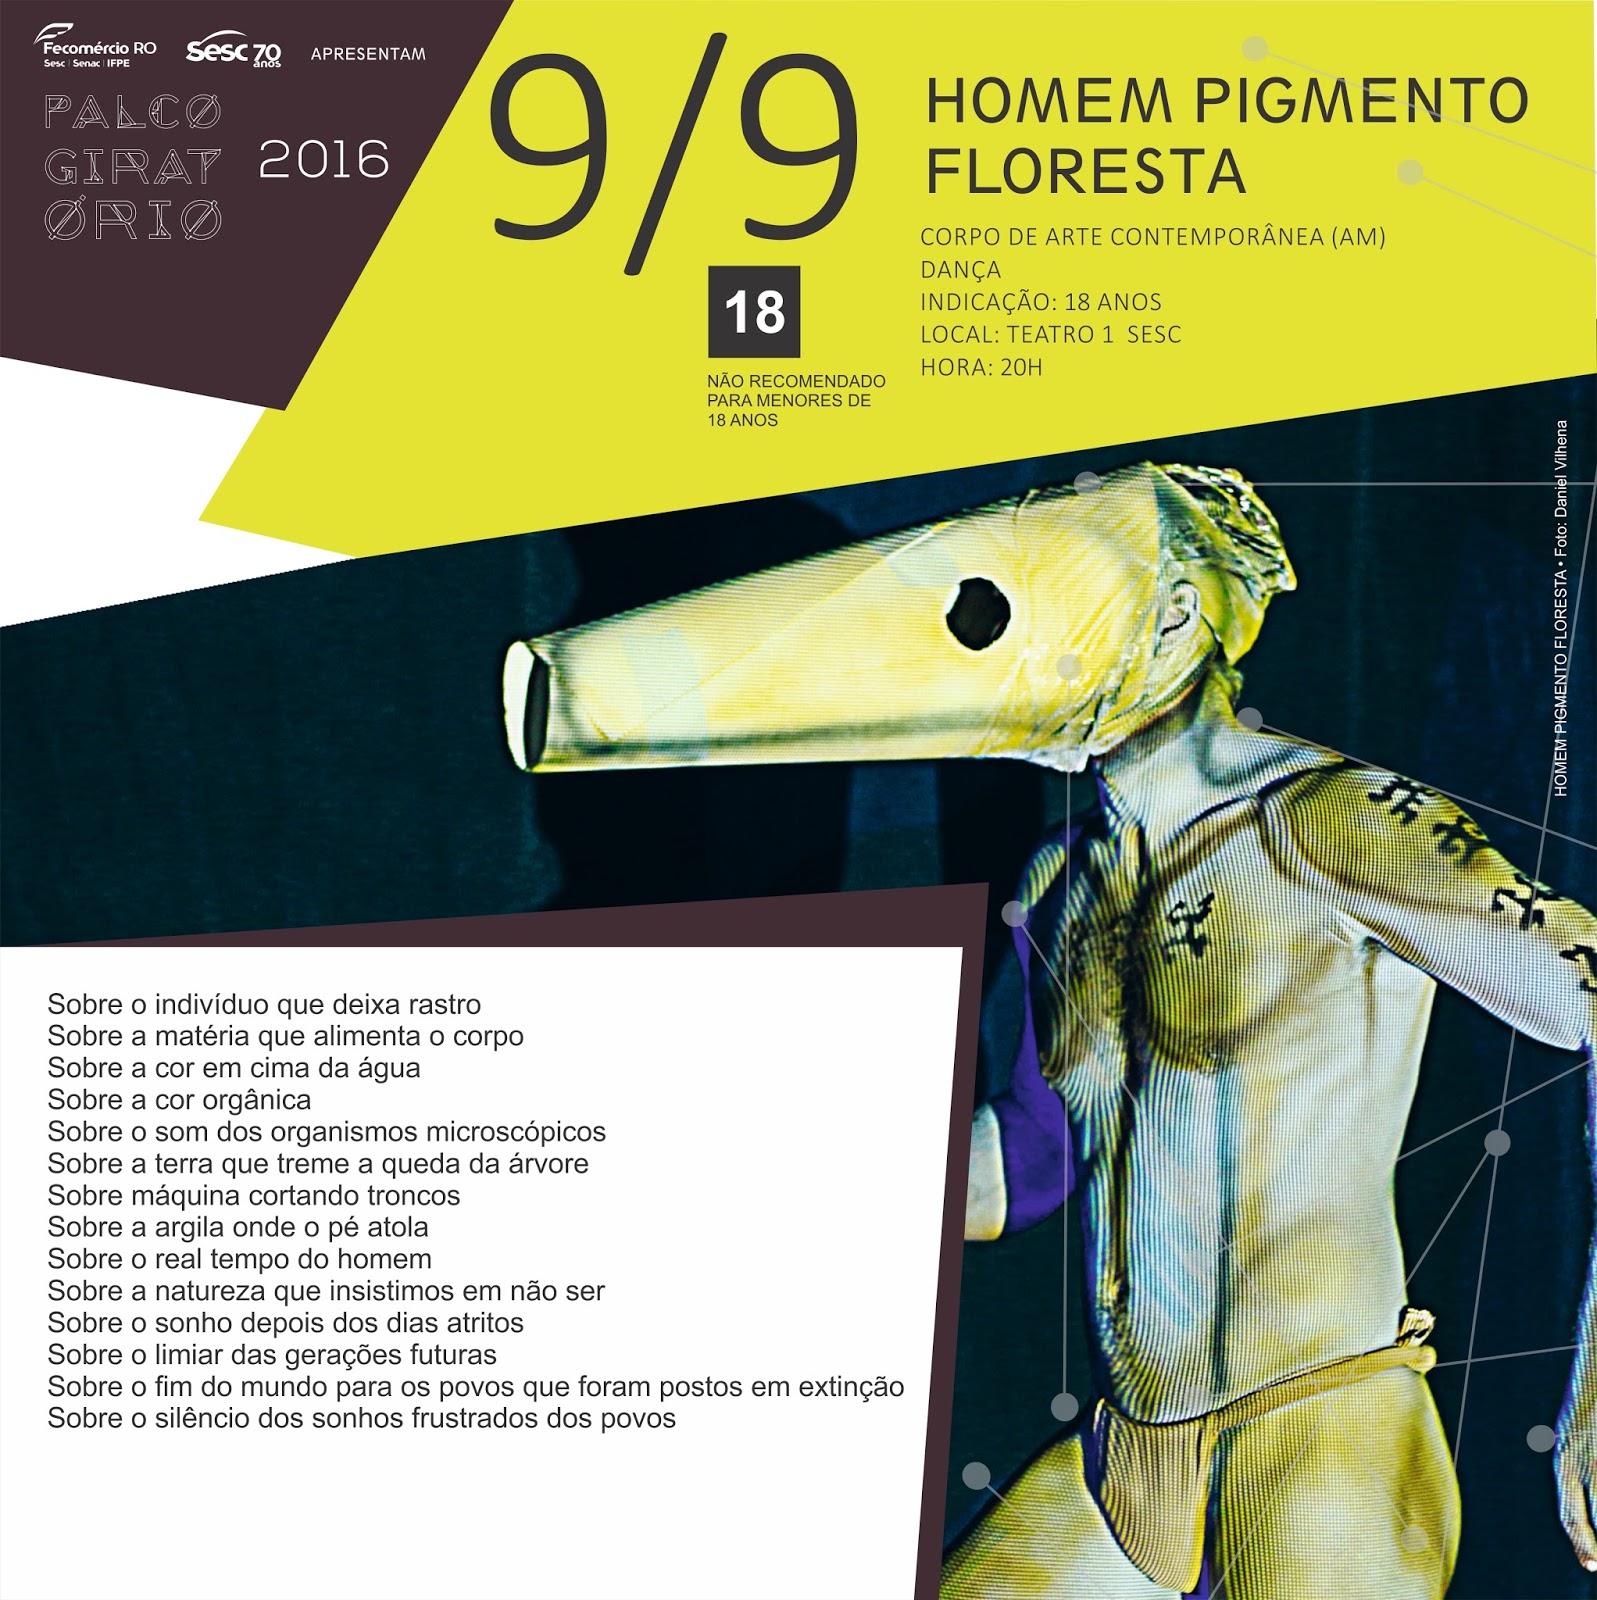 090916-PALCO-GIRATORIO.jpg